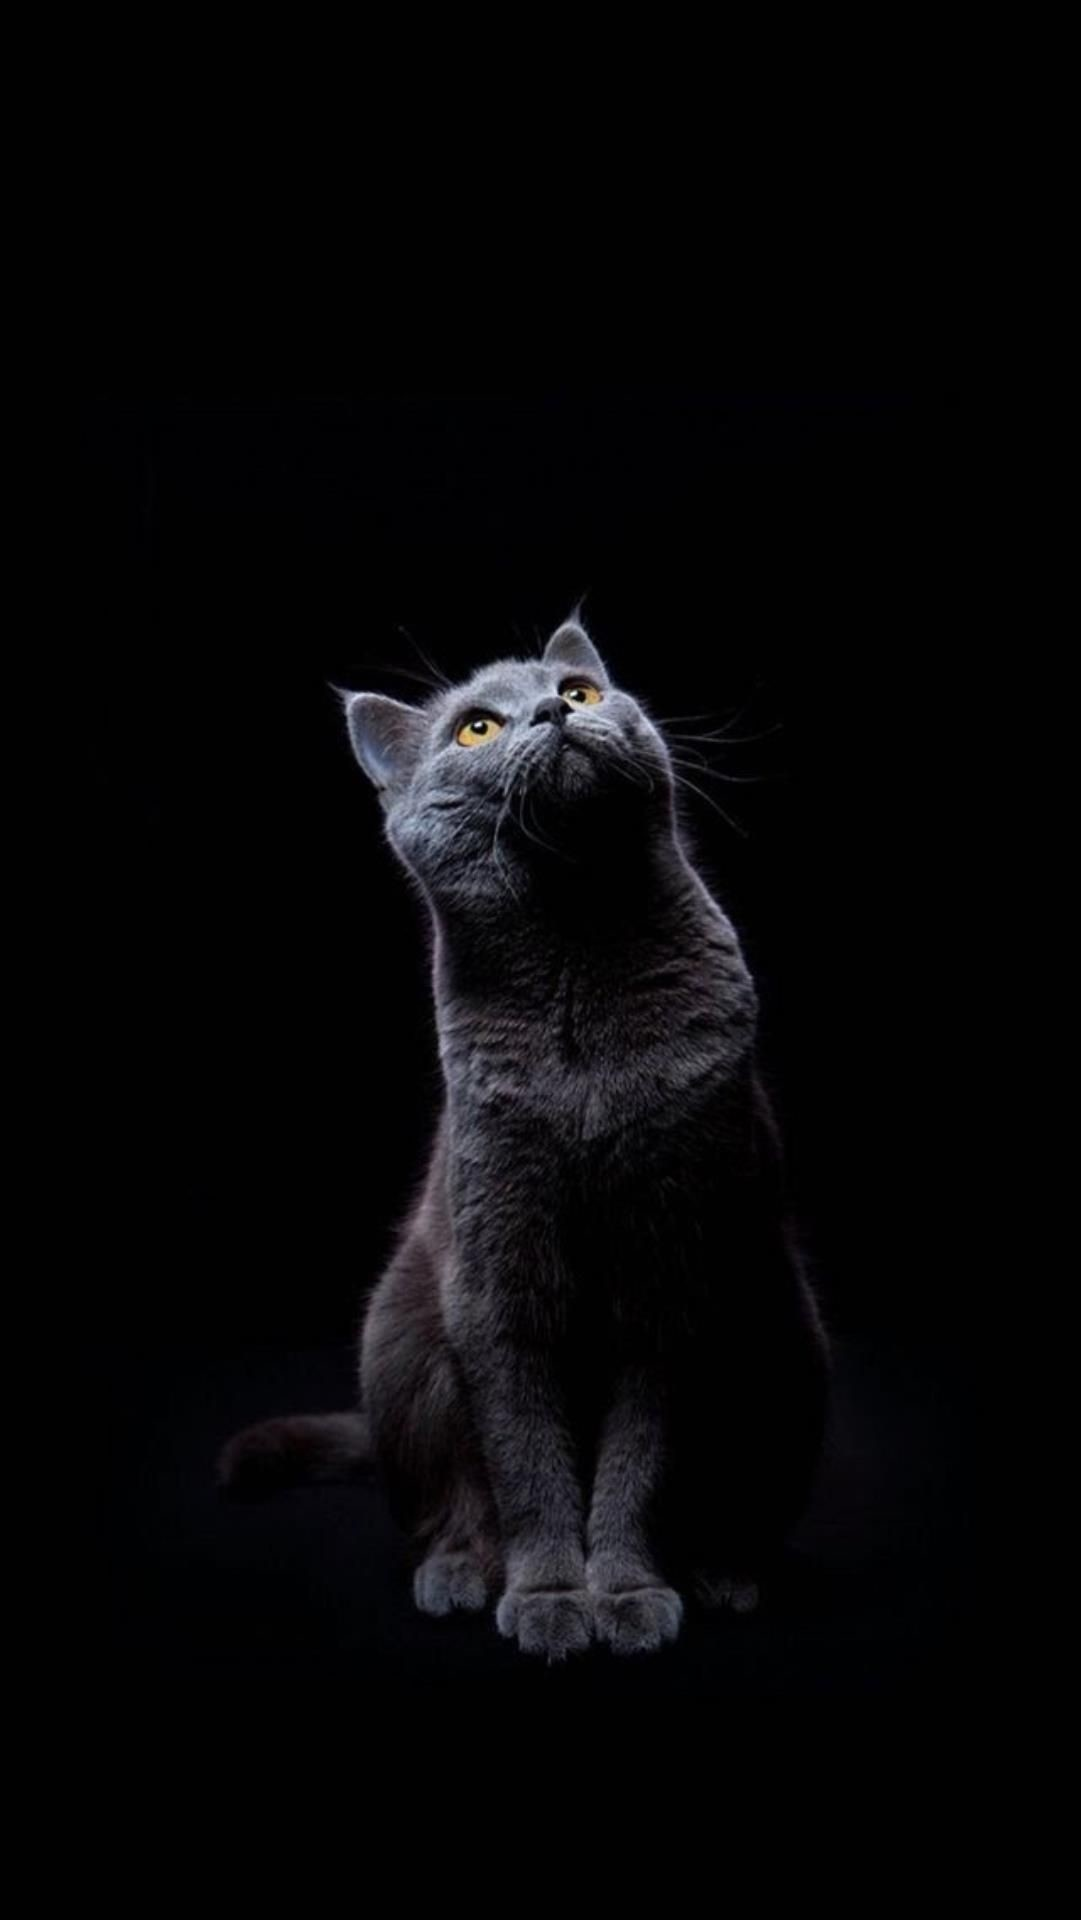 Cute Cat Iphone Wallpaper 87 Images